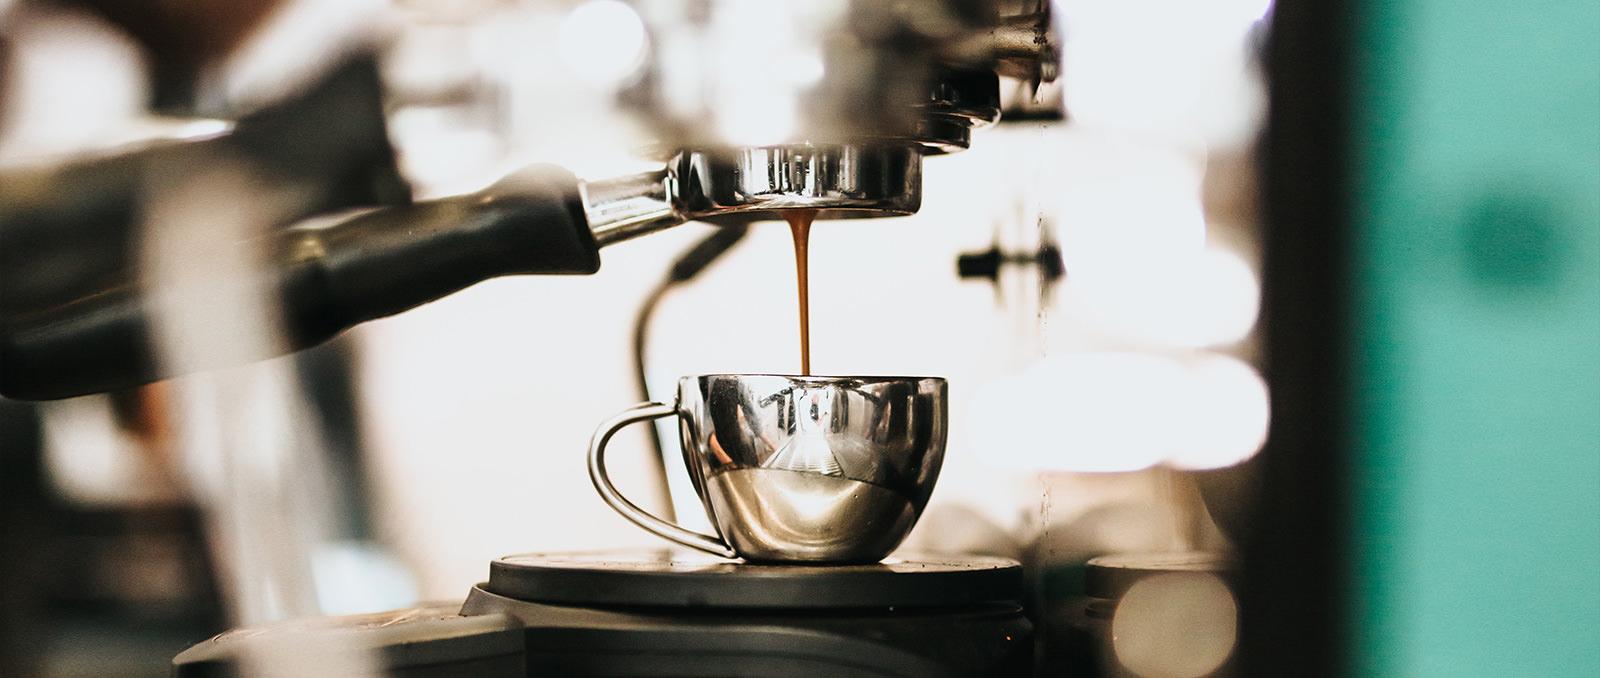 haseborg-kaffee-impressum